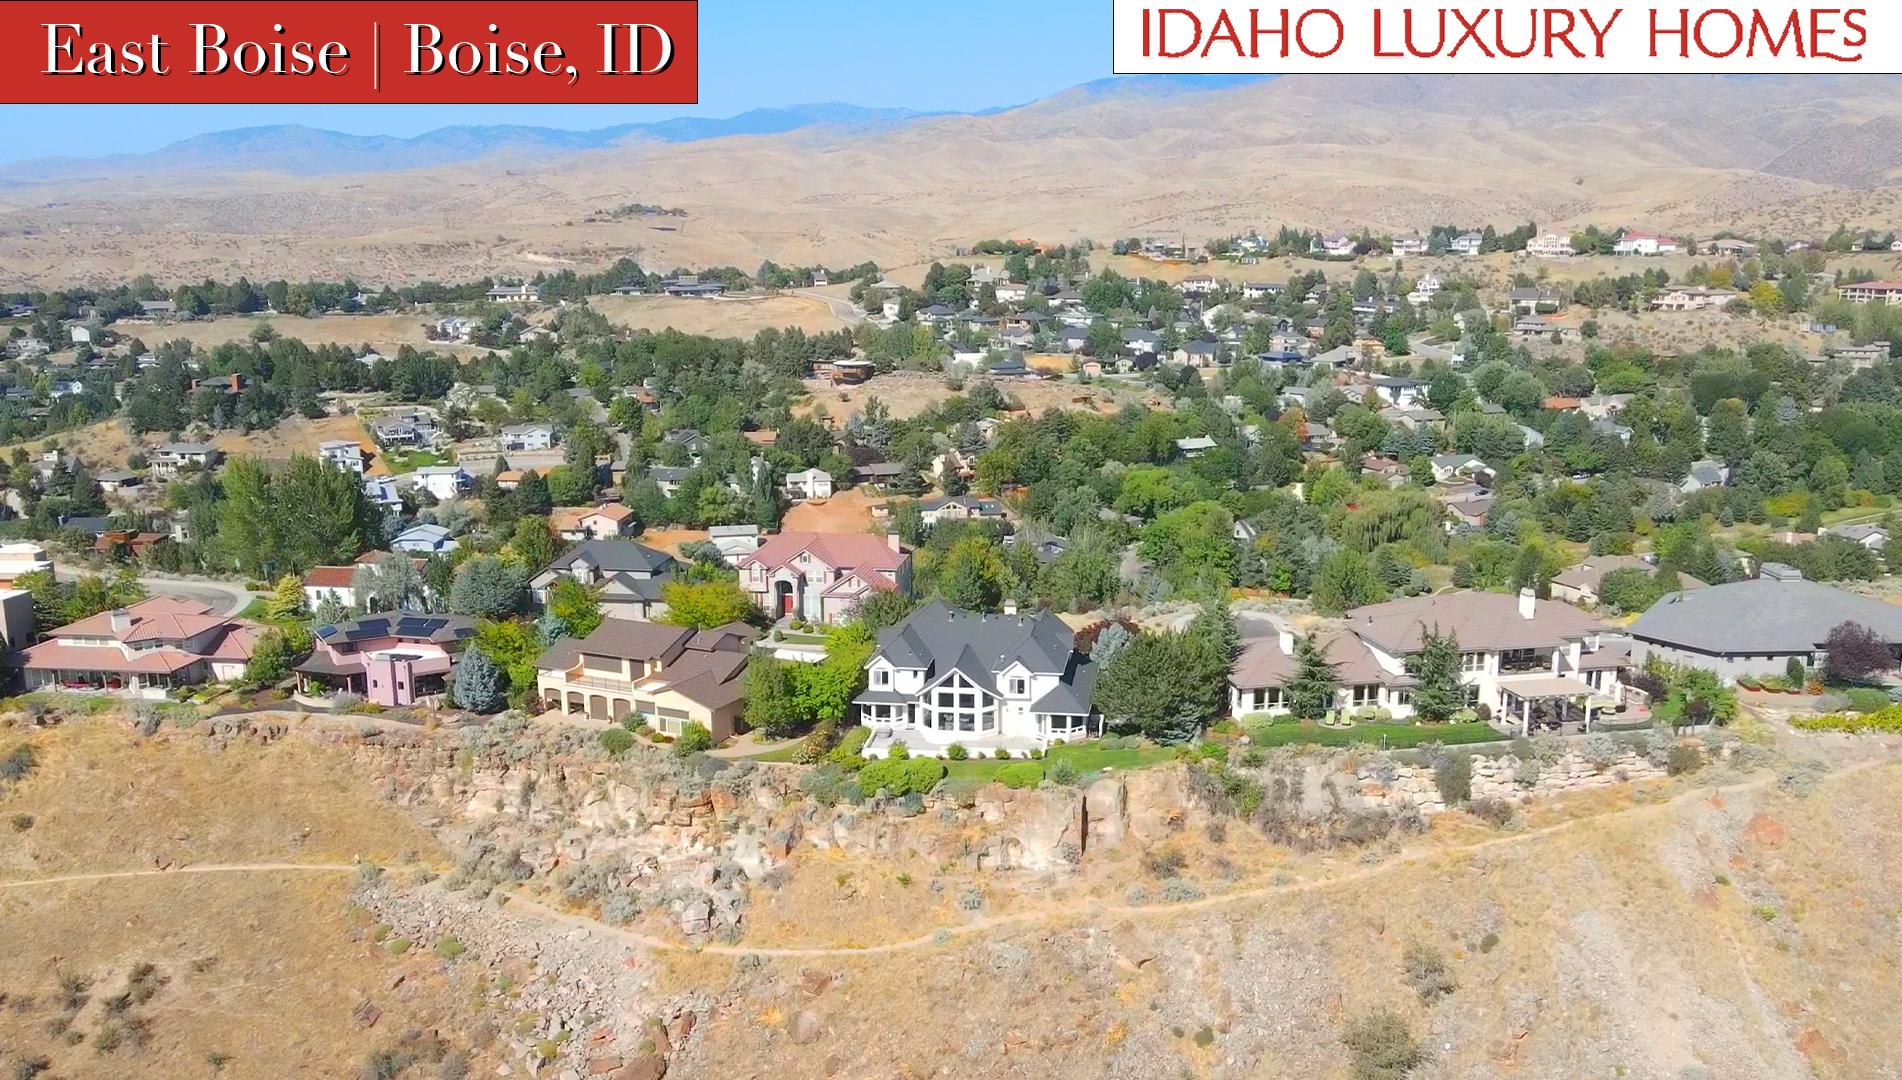 East Boise Real Estate